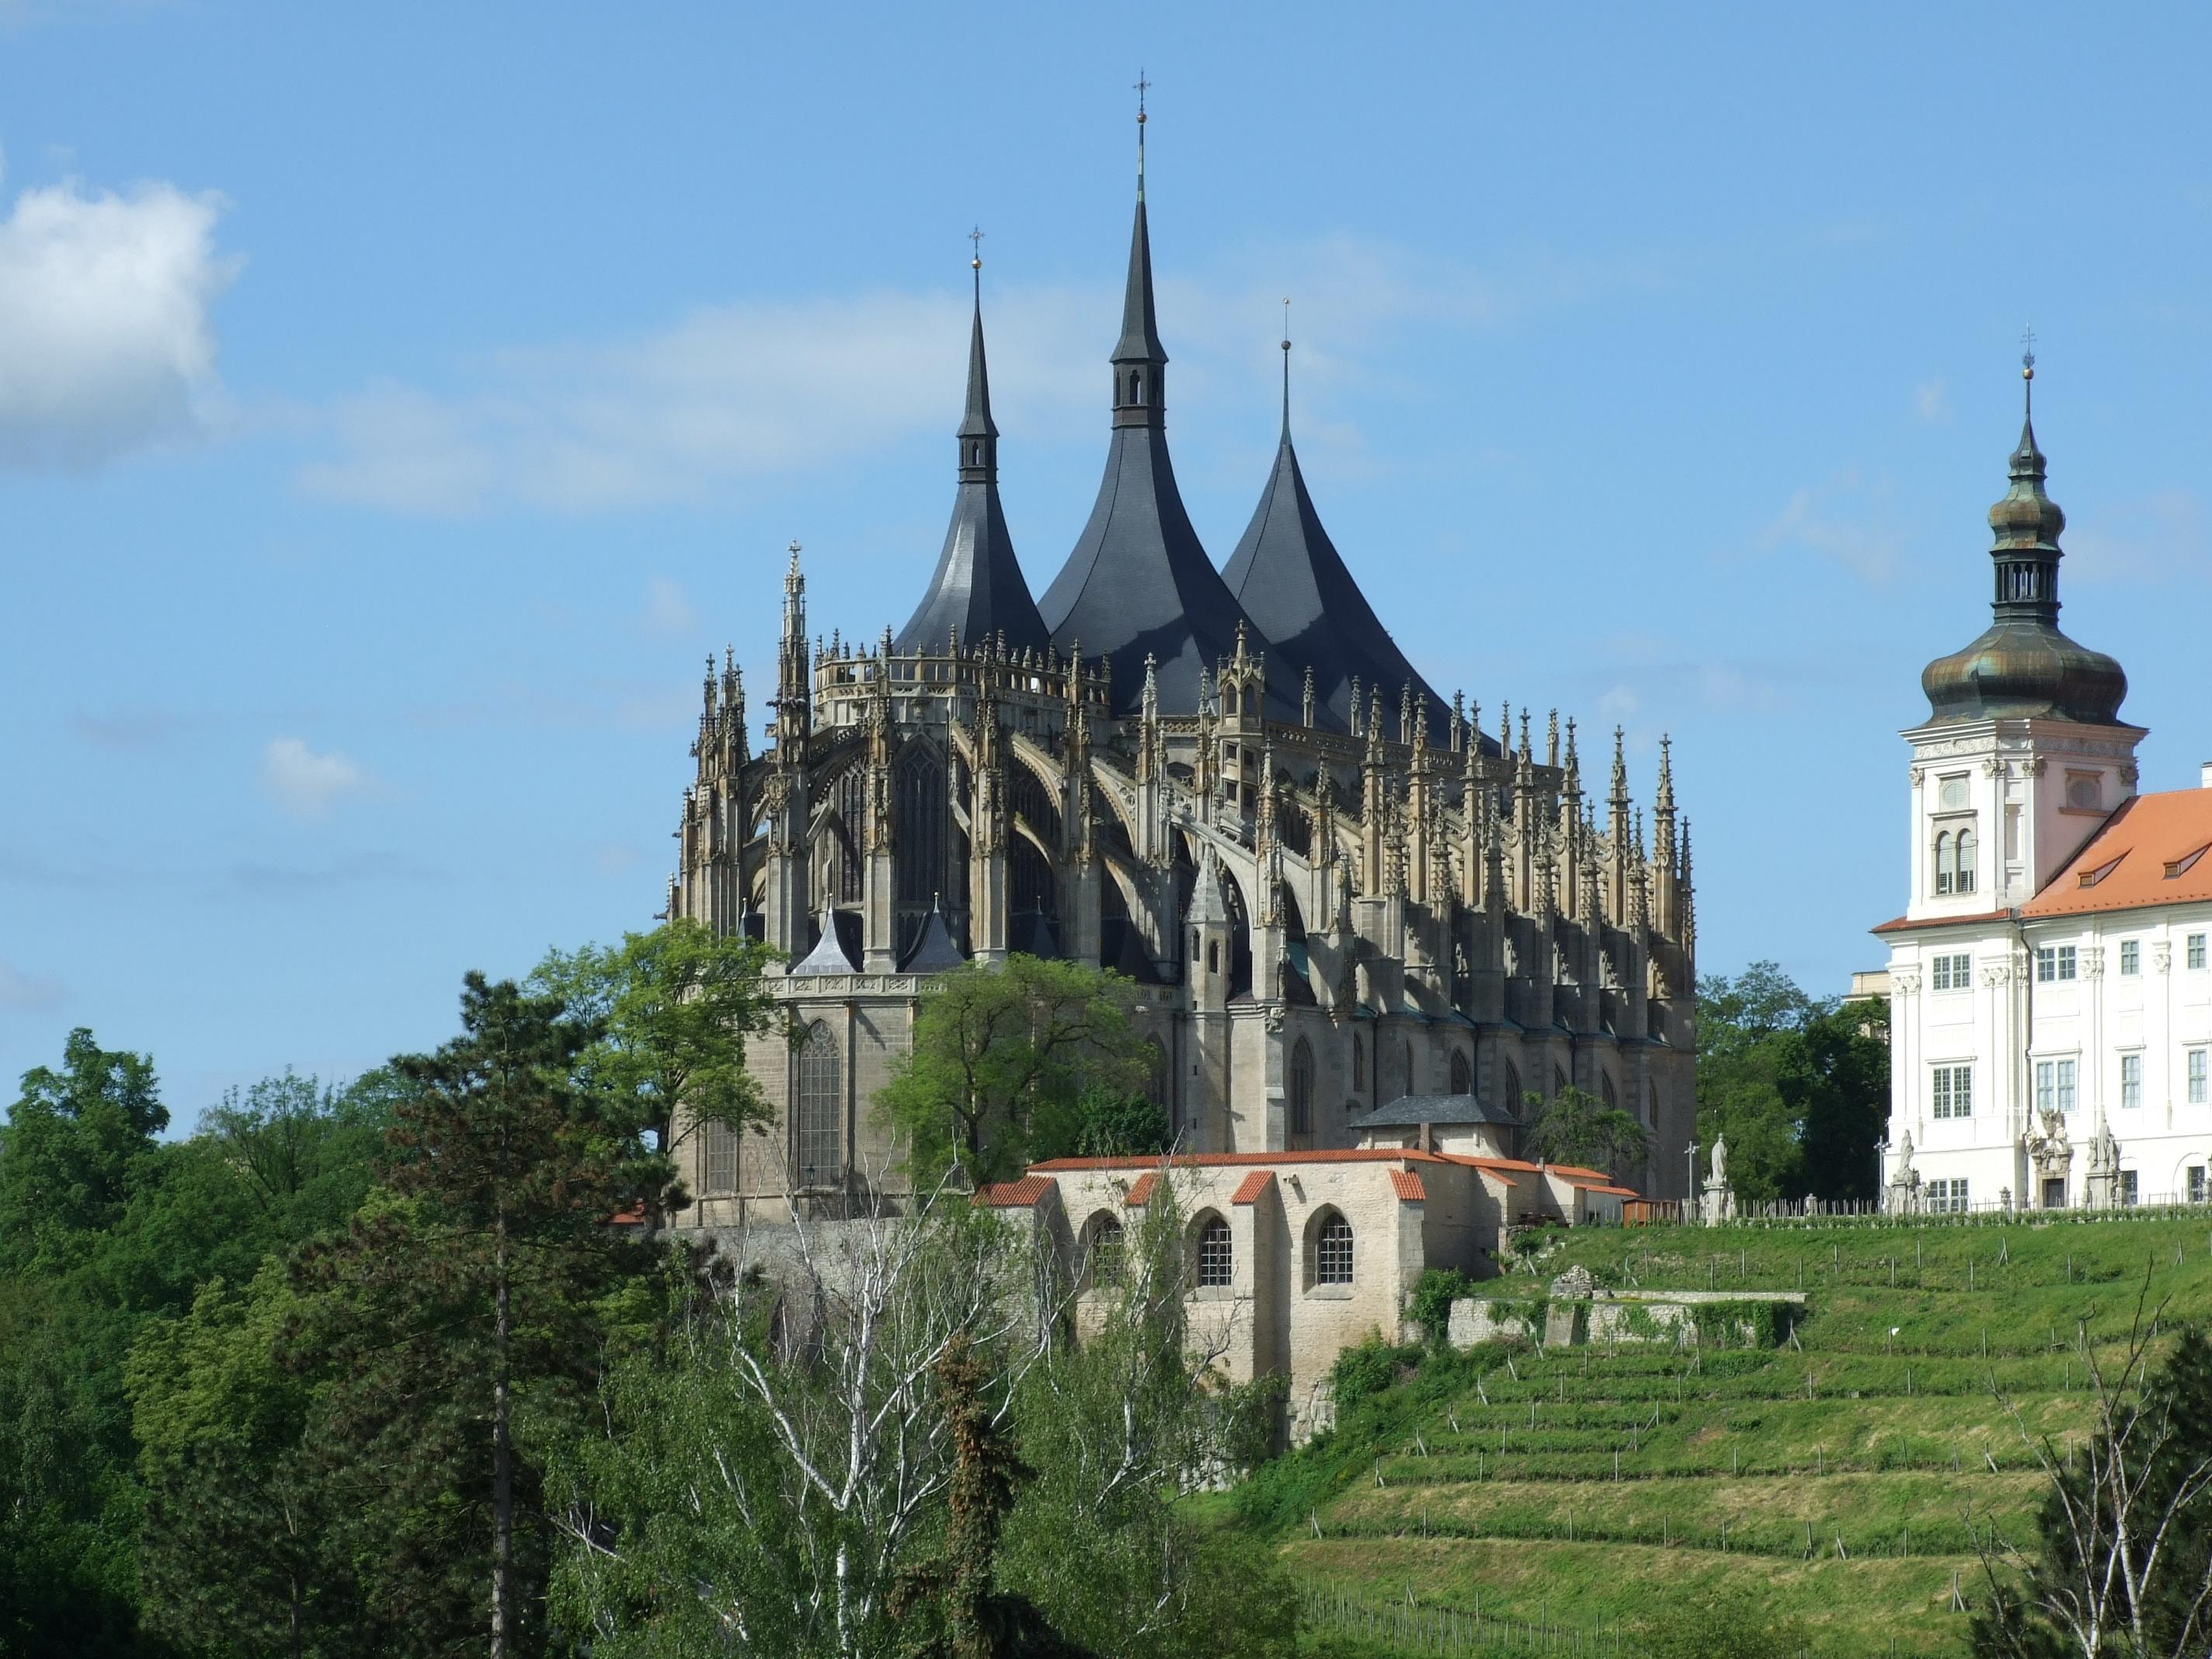 9538-chram-sv-barbora-st-barbara-s-cathedral.jpg